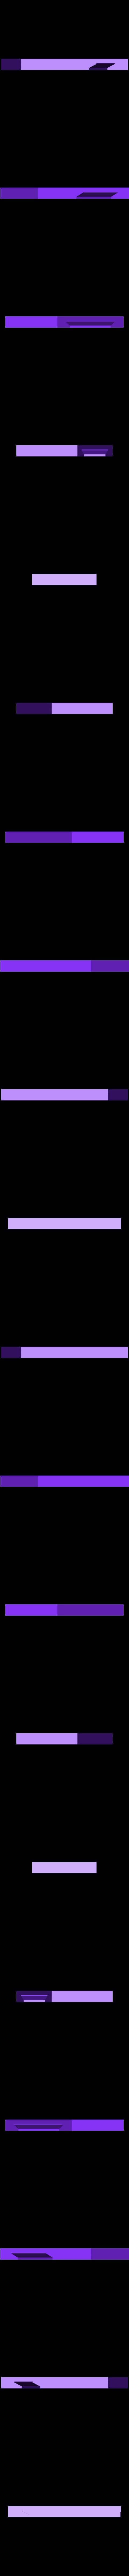 Wall_part.stl Download free STL file Samsung Monitor 2494LW • 3D printer object, Raeunn3D